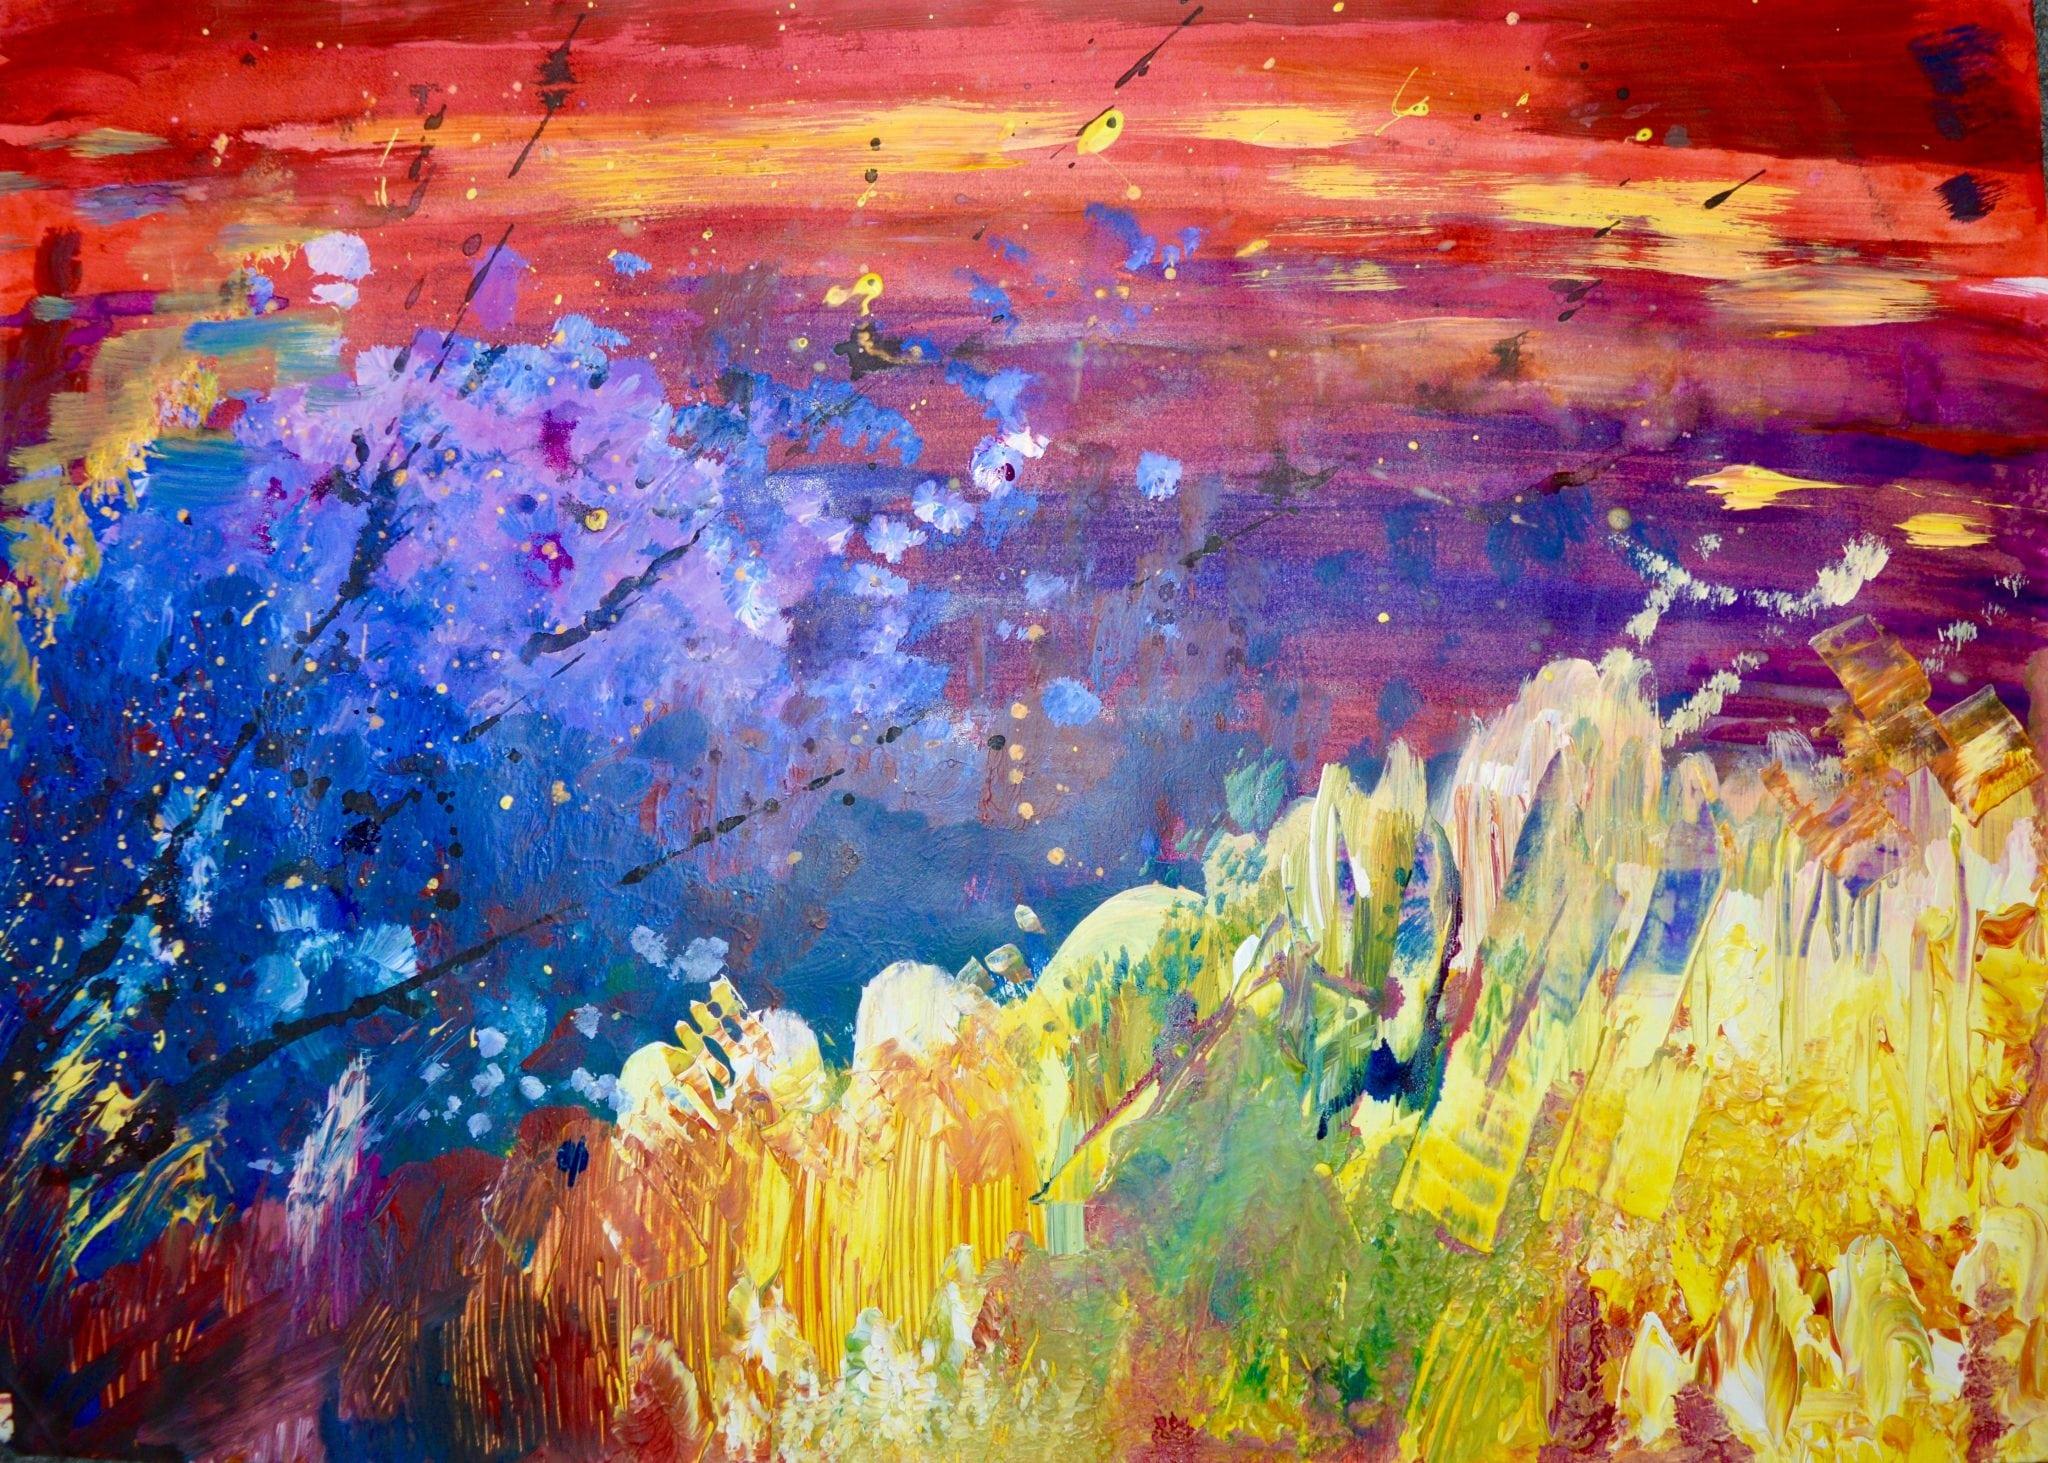 Painting Through Sound